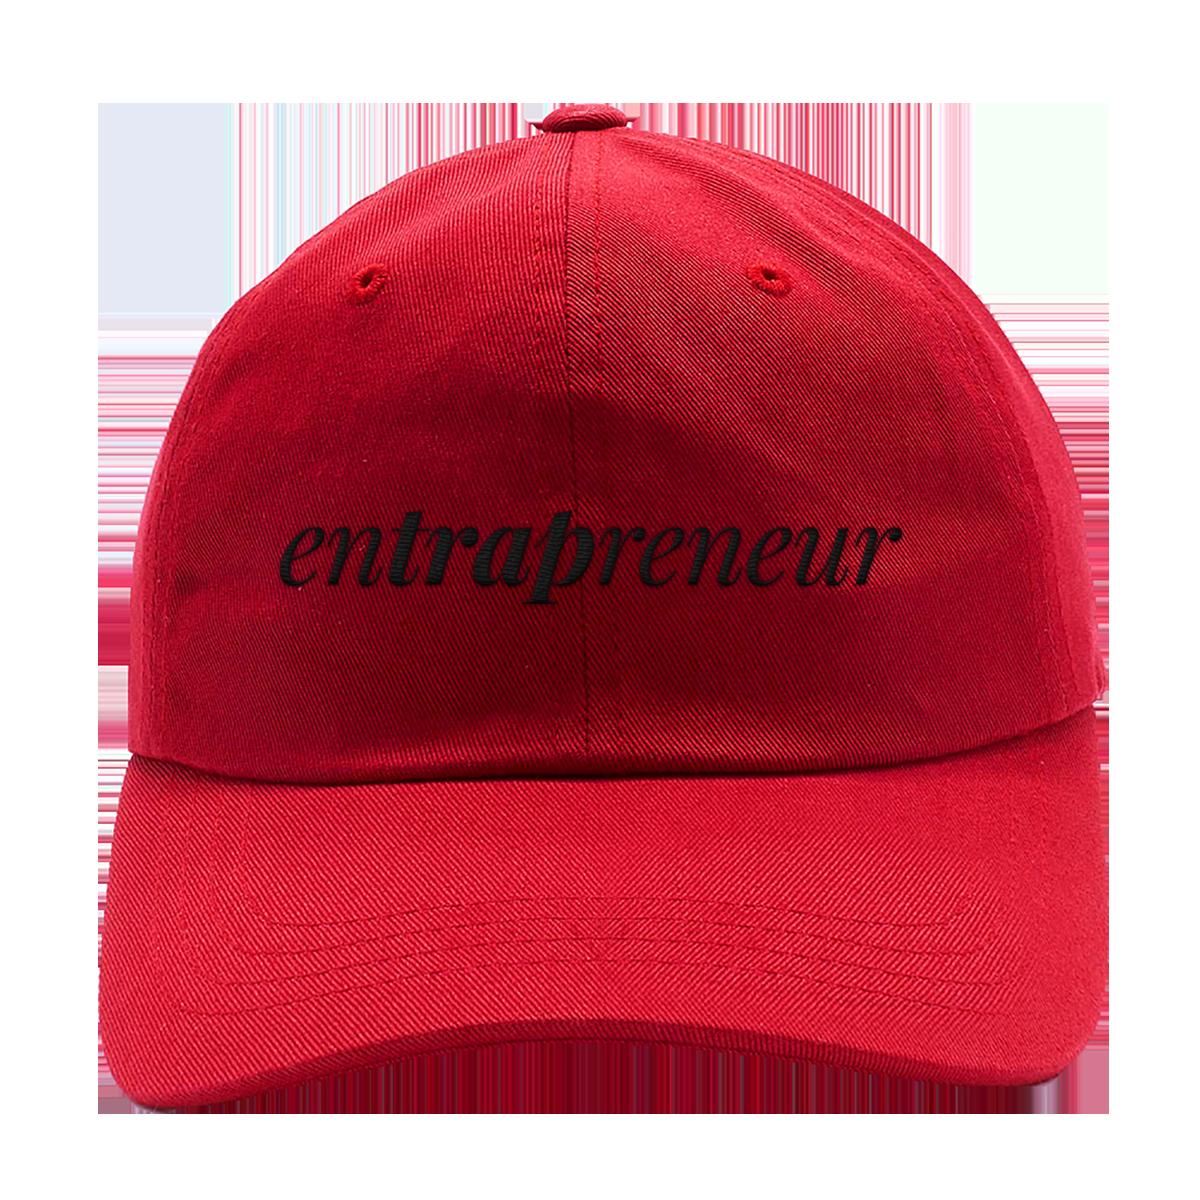 Entrapreneur Dad Hat [Red]